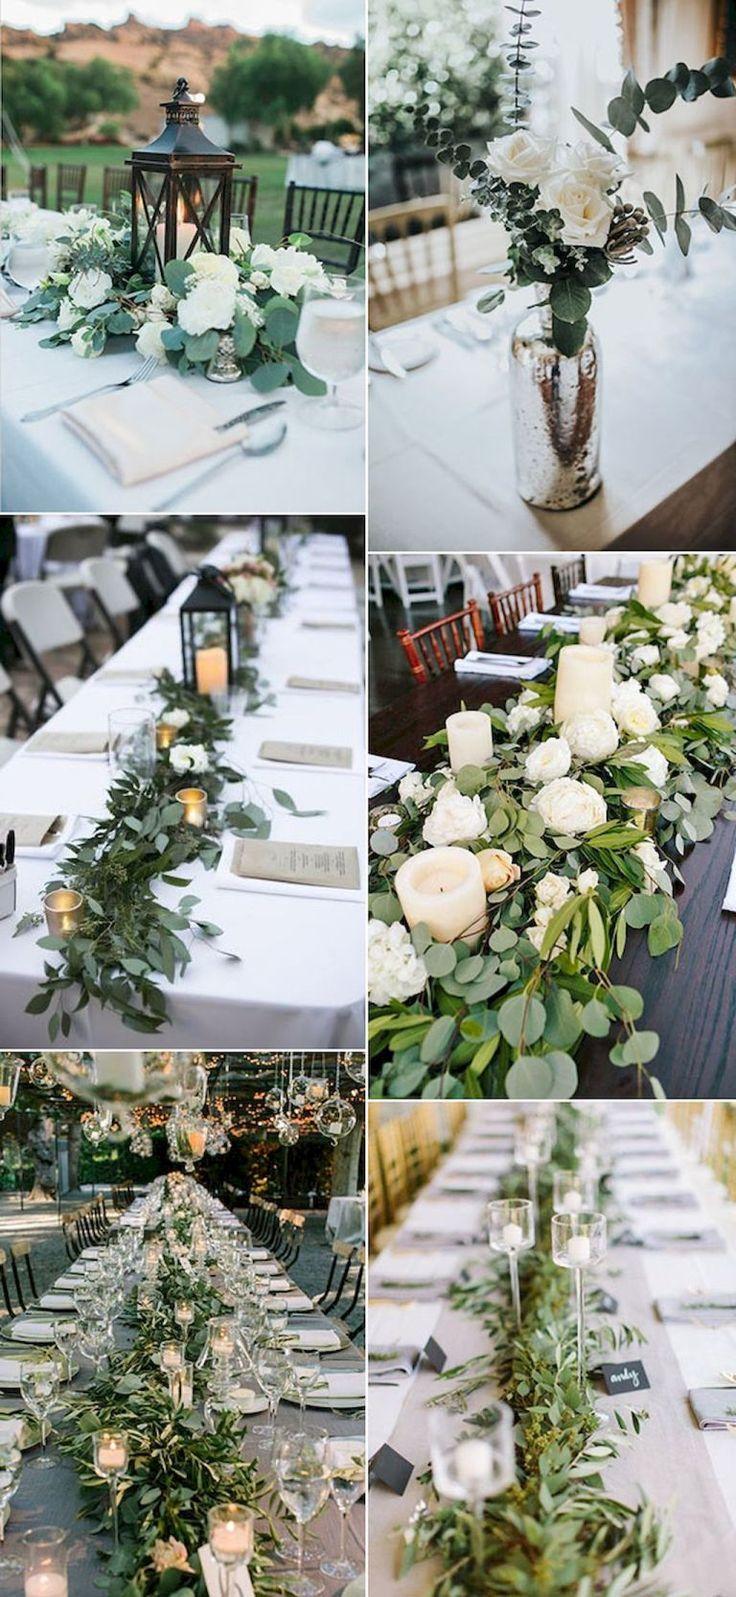 White wedding decor ideas   Best Greenery Wedding Decor Ideas  Weddings  Pinterest